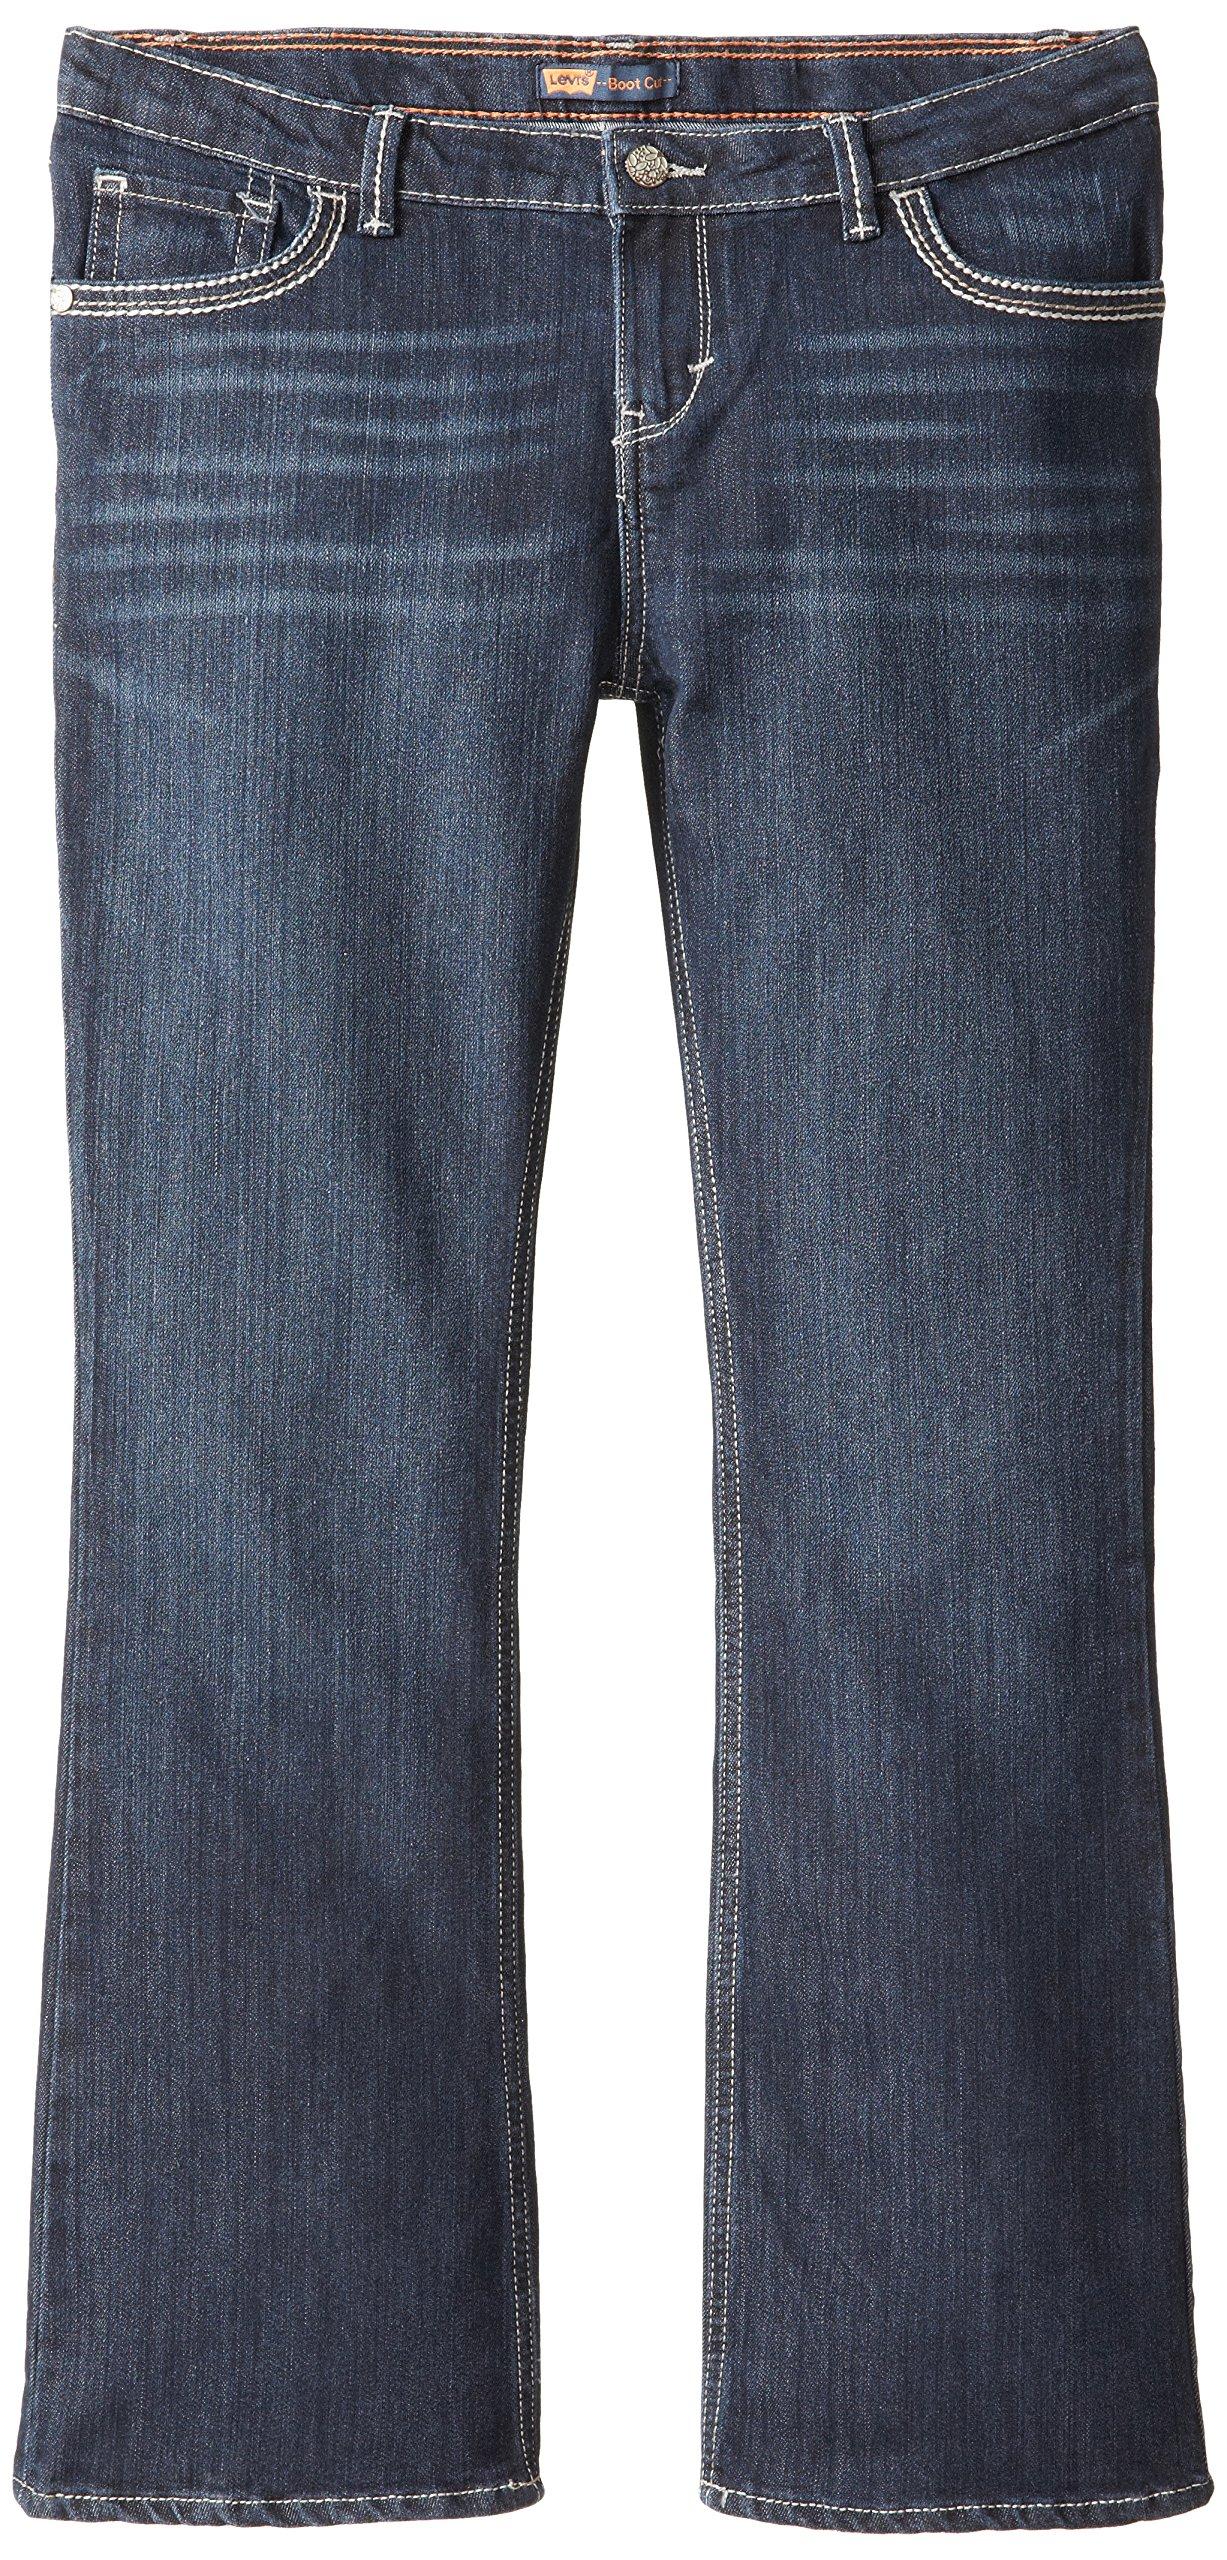 Levi's Girls' Plus Size 715 Bootcut Thick Stitch Jeans, Tailored Indigo 16.5